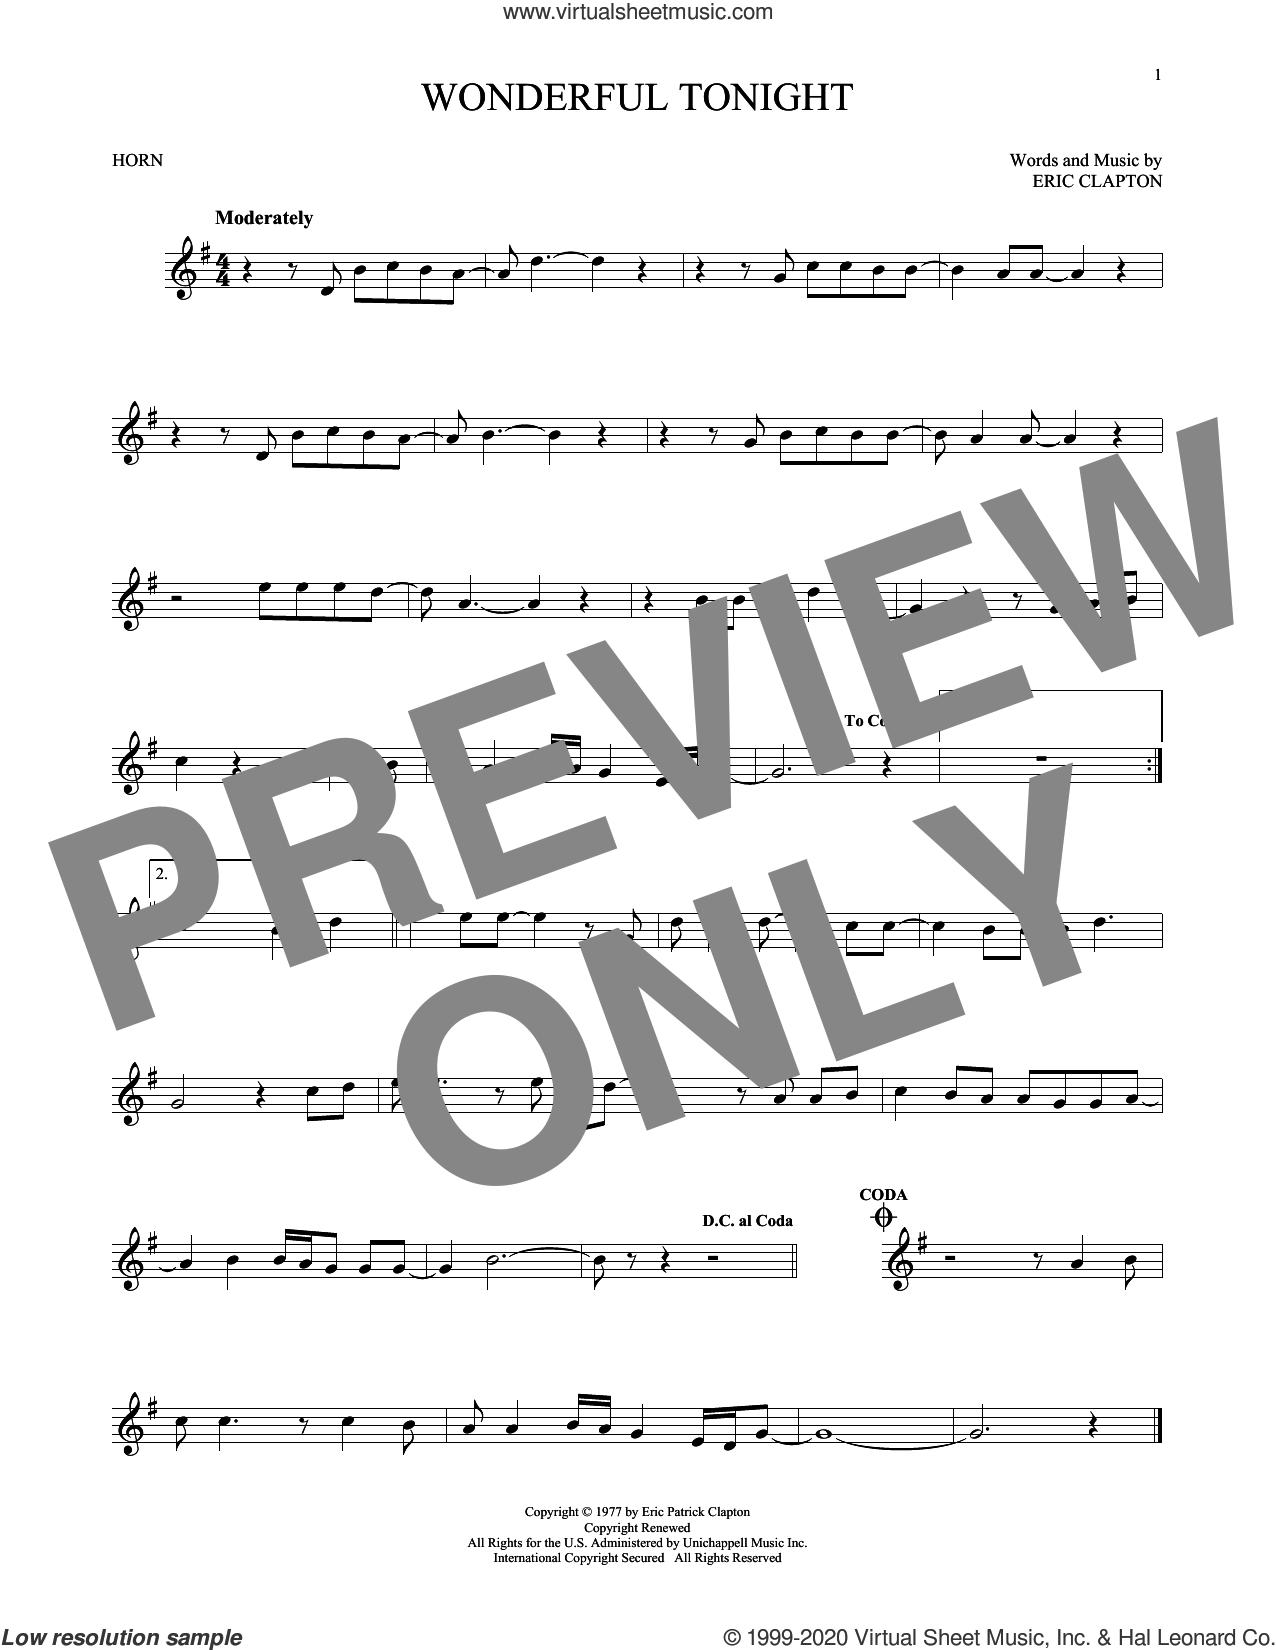 Wonderful Tonight sheet music for horn solo by Eric Clapton and David Kersh, wedding score, intermediate skill level